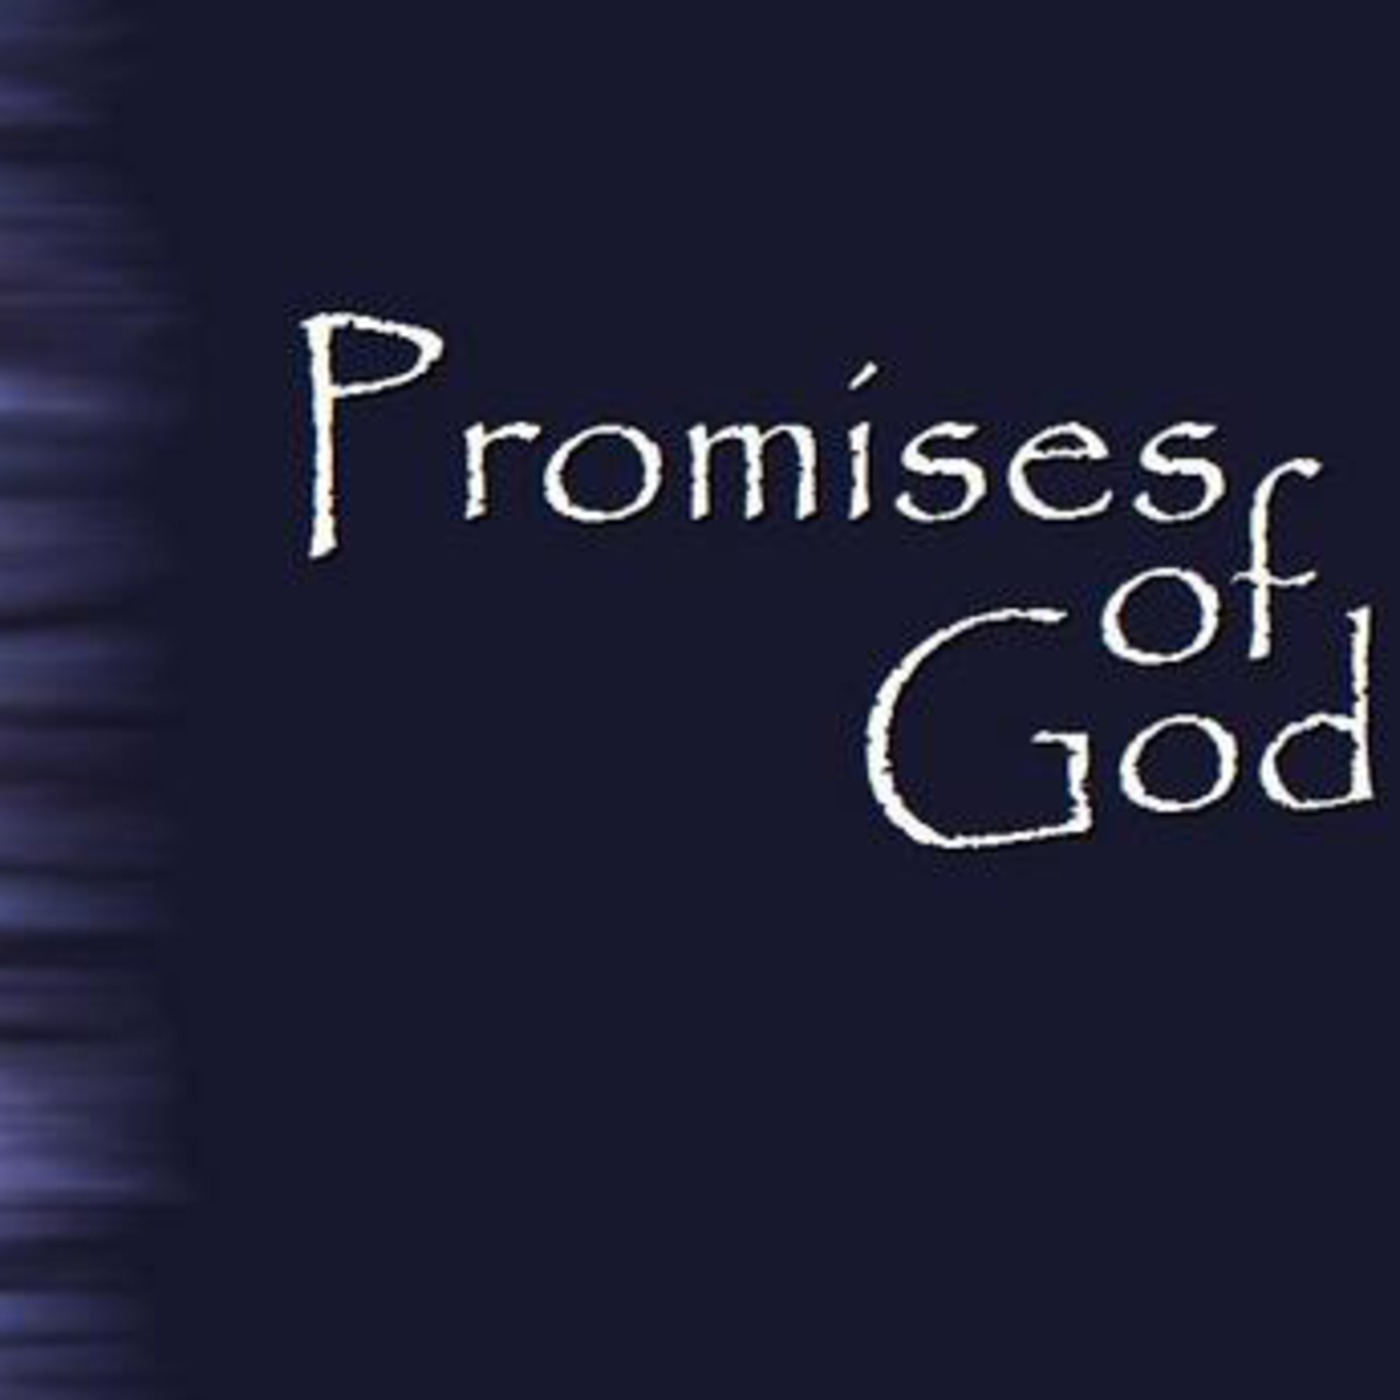 Promises of God - Treasures in Heaven